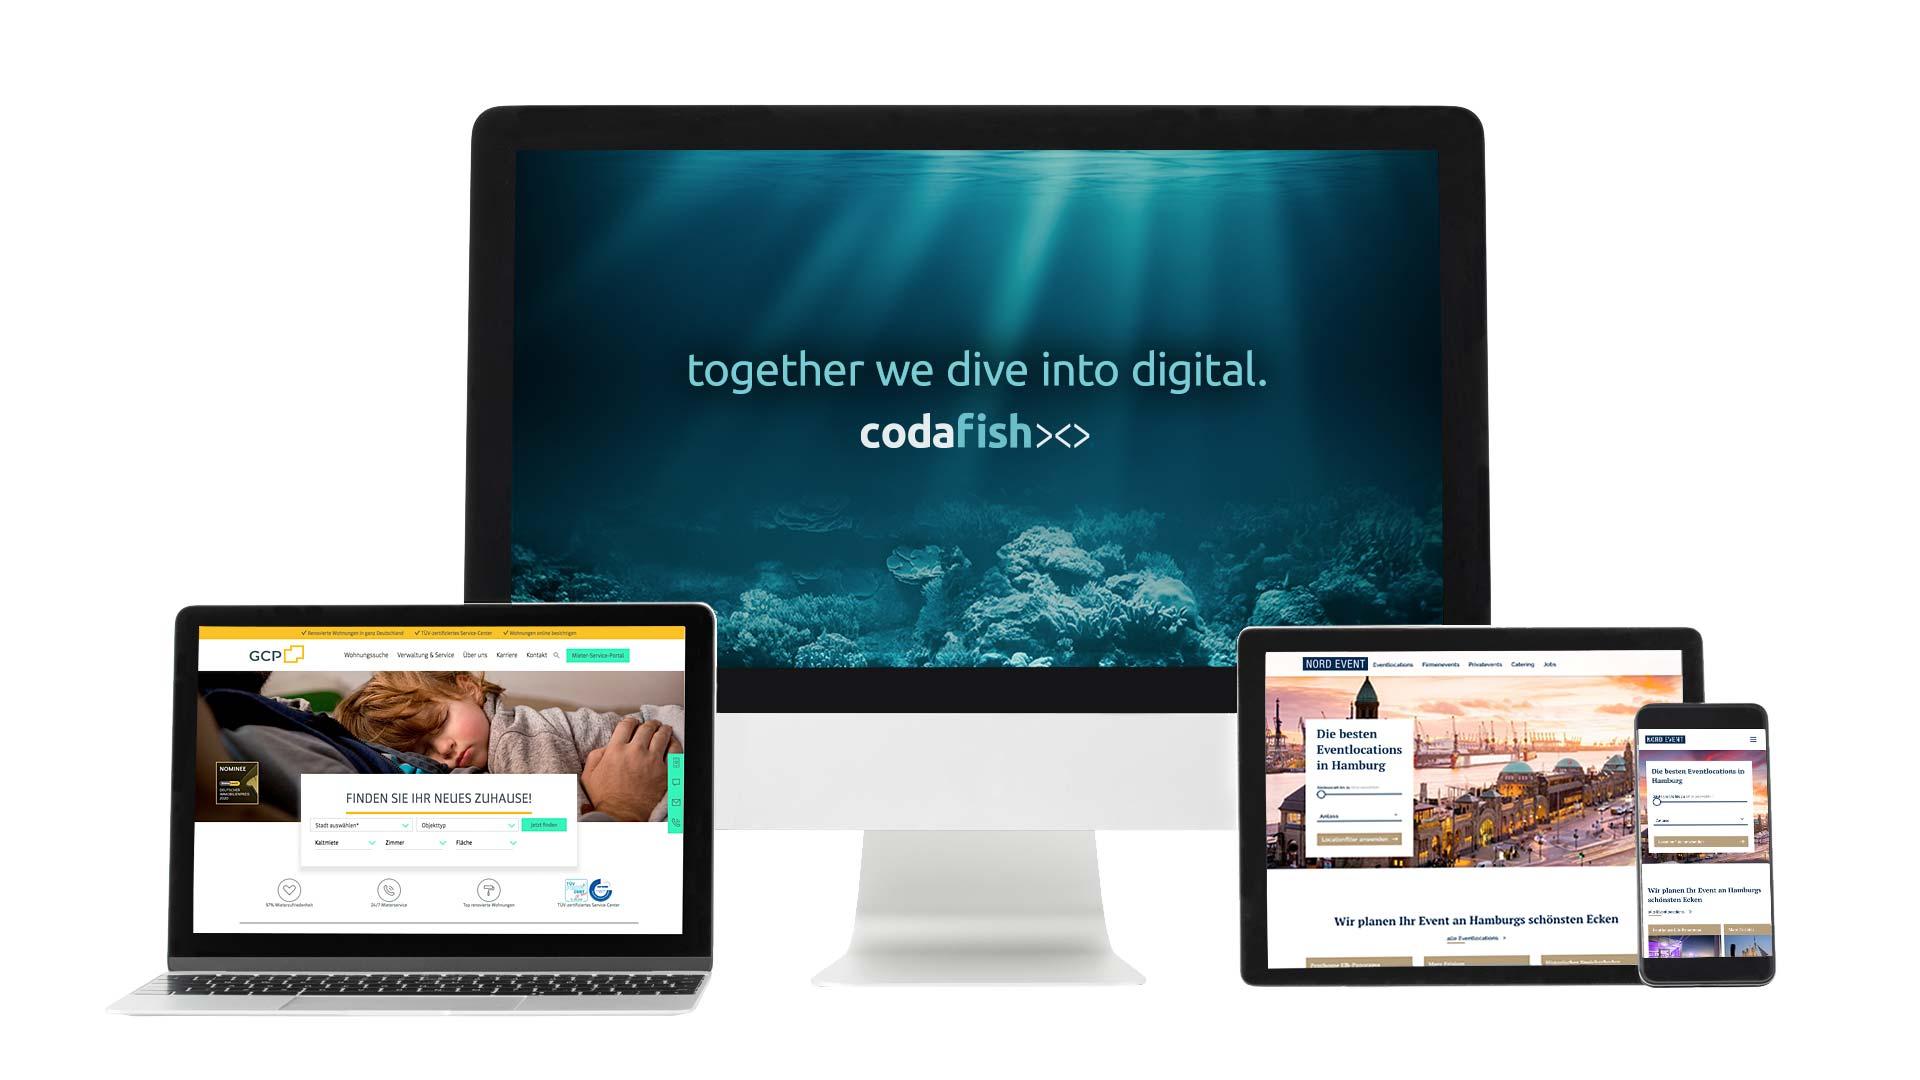 desktop mobile screen proyecto referencia codafish grandcity property nordevent clientes